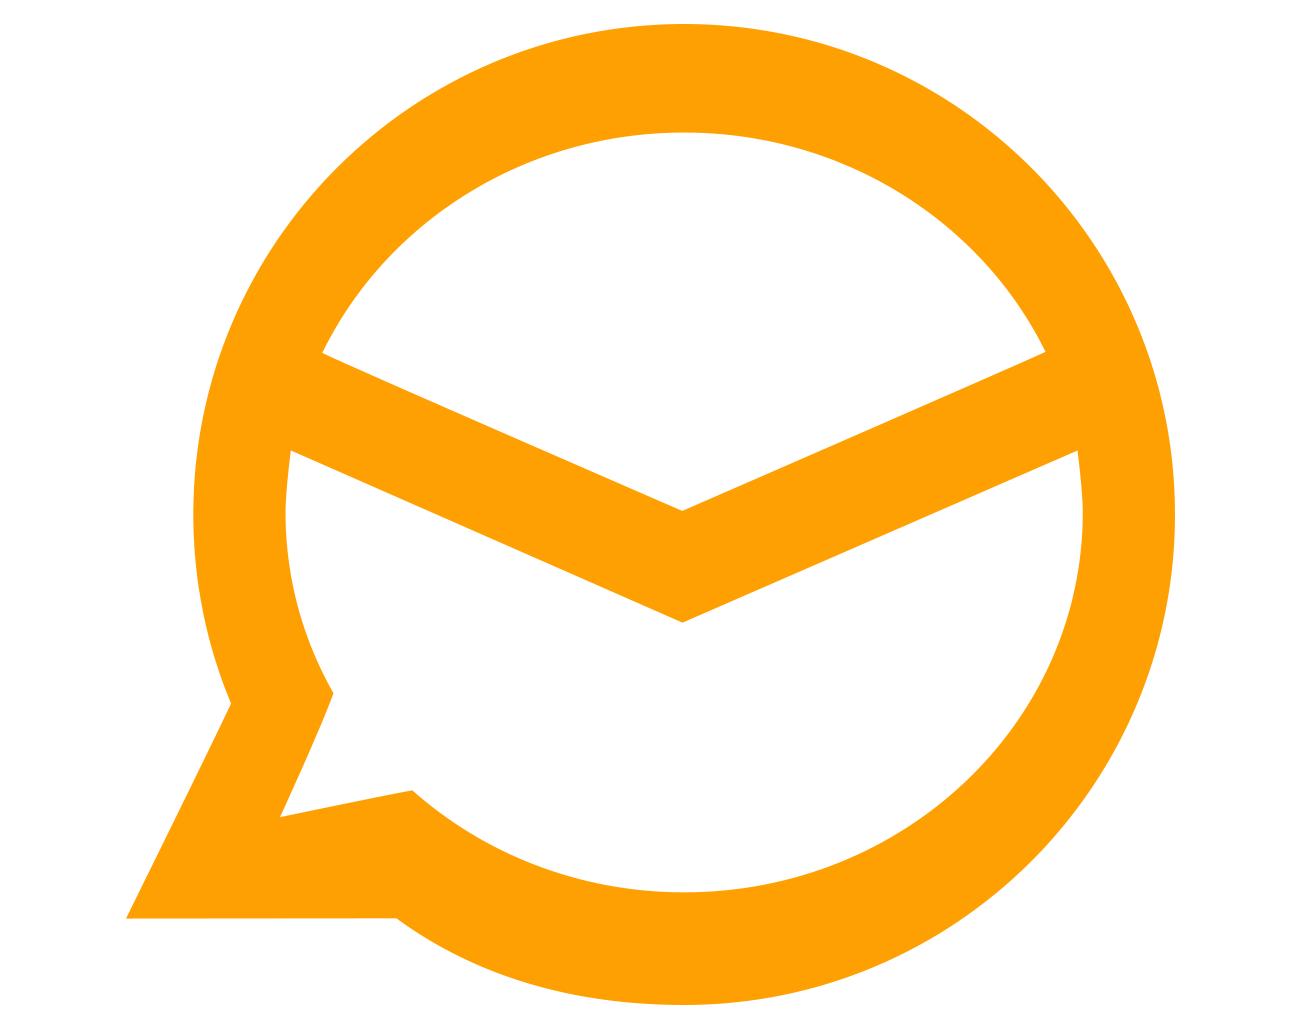 https://www.emclient.com/media/images/logos/emclient-large.png?v7